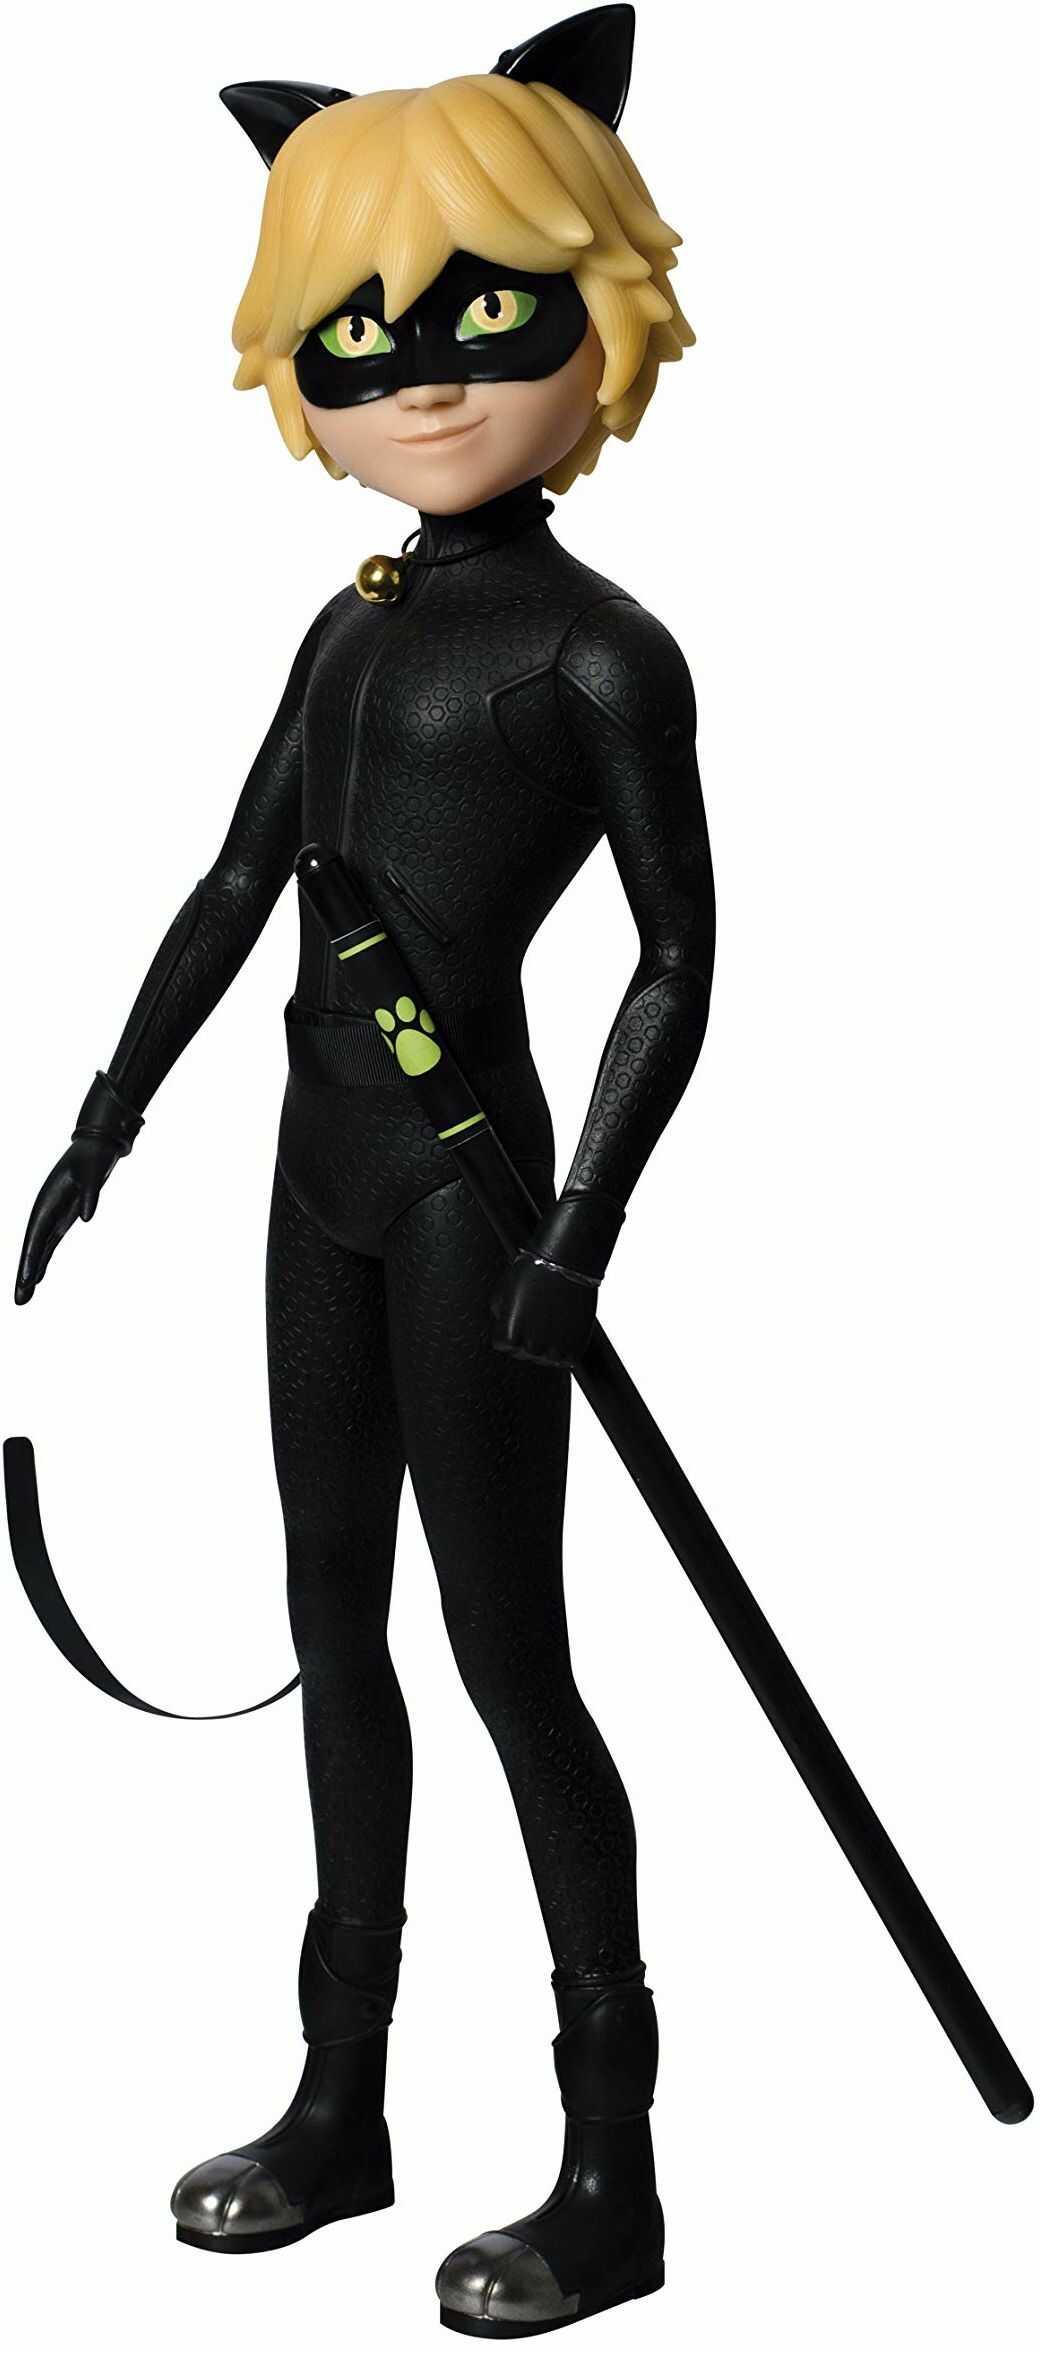 Dujardin zabawka Miraculous kot, czarna